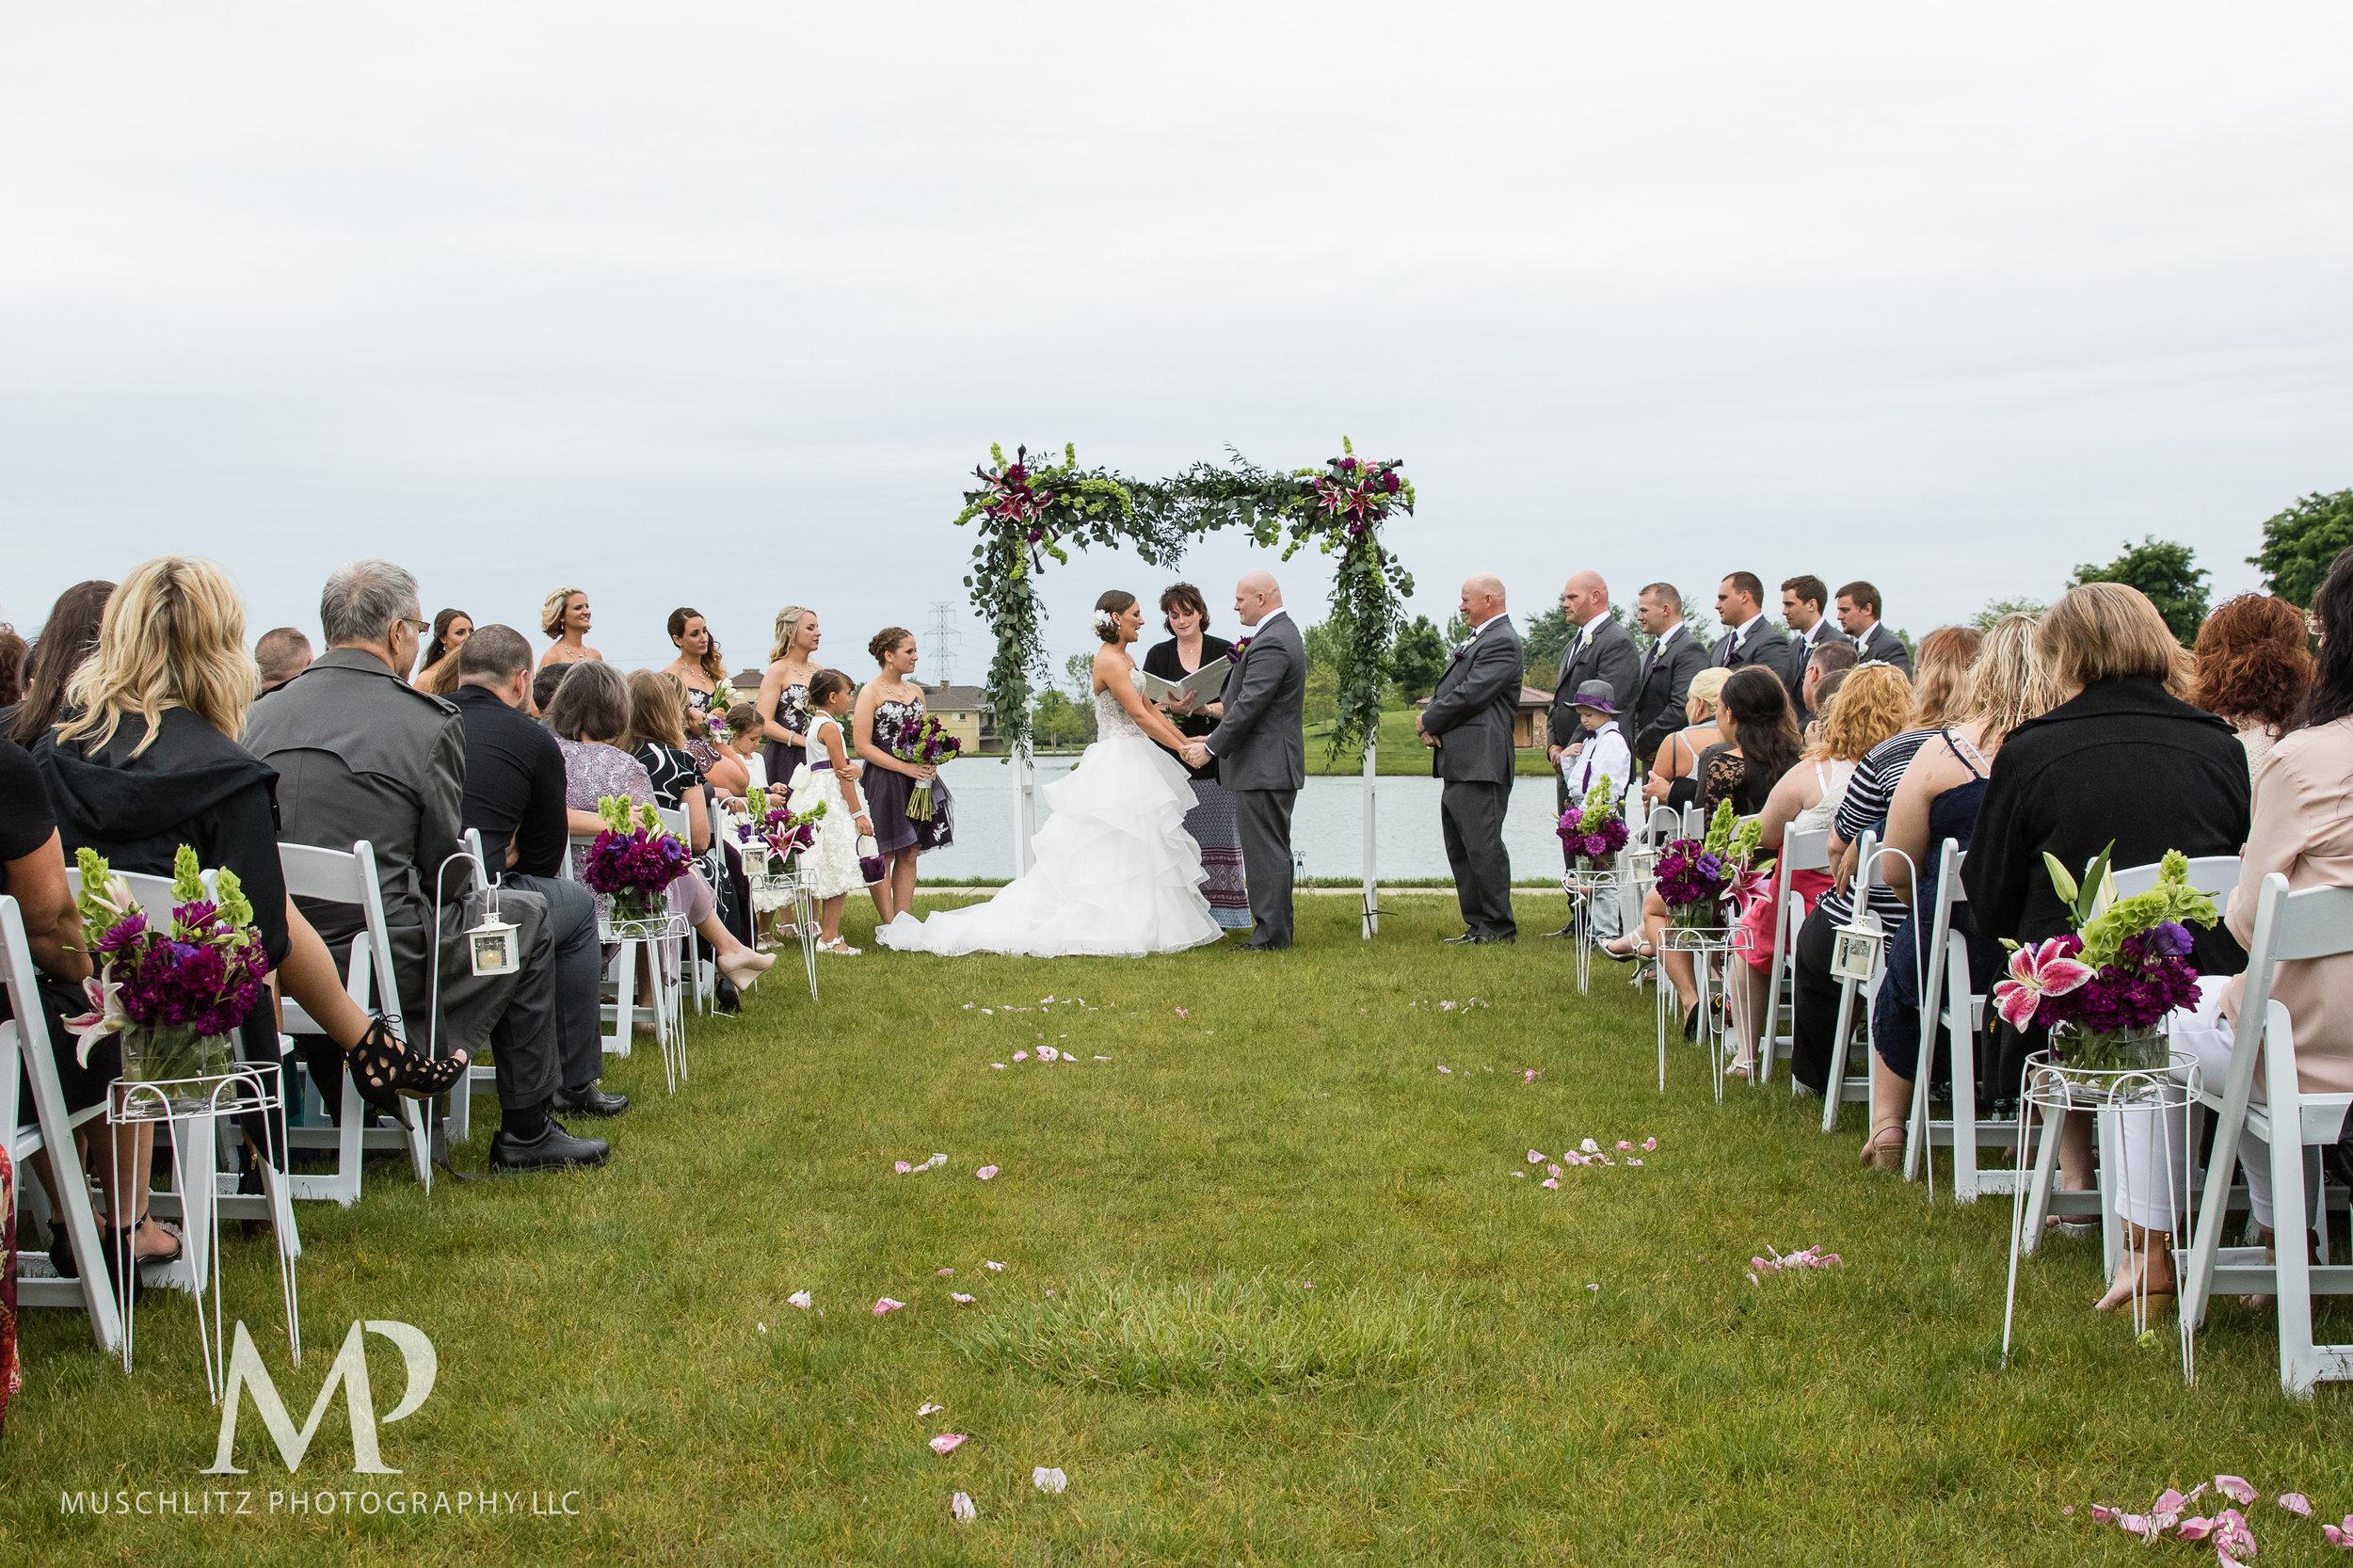 club-at-corazon-wedding-ceremony-reception-columbus-dublin-ohio-ohio-university-theme-039.JPG